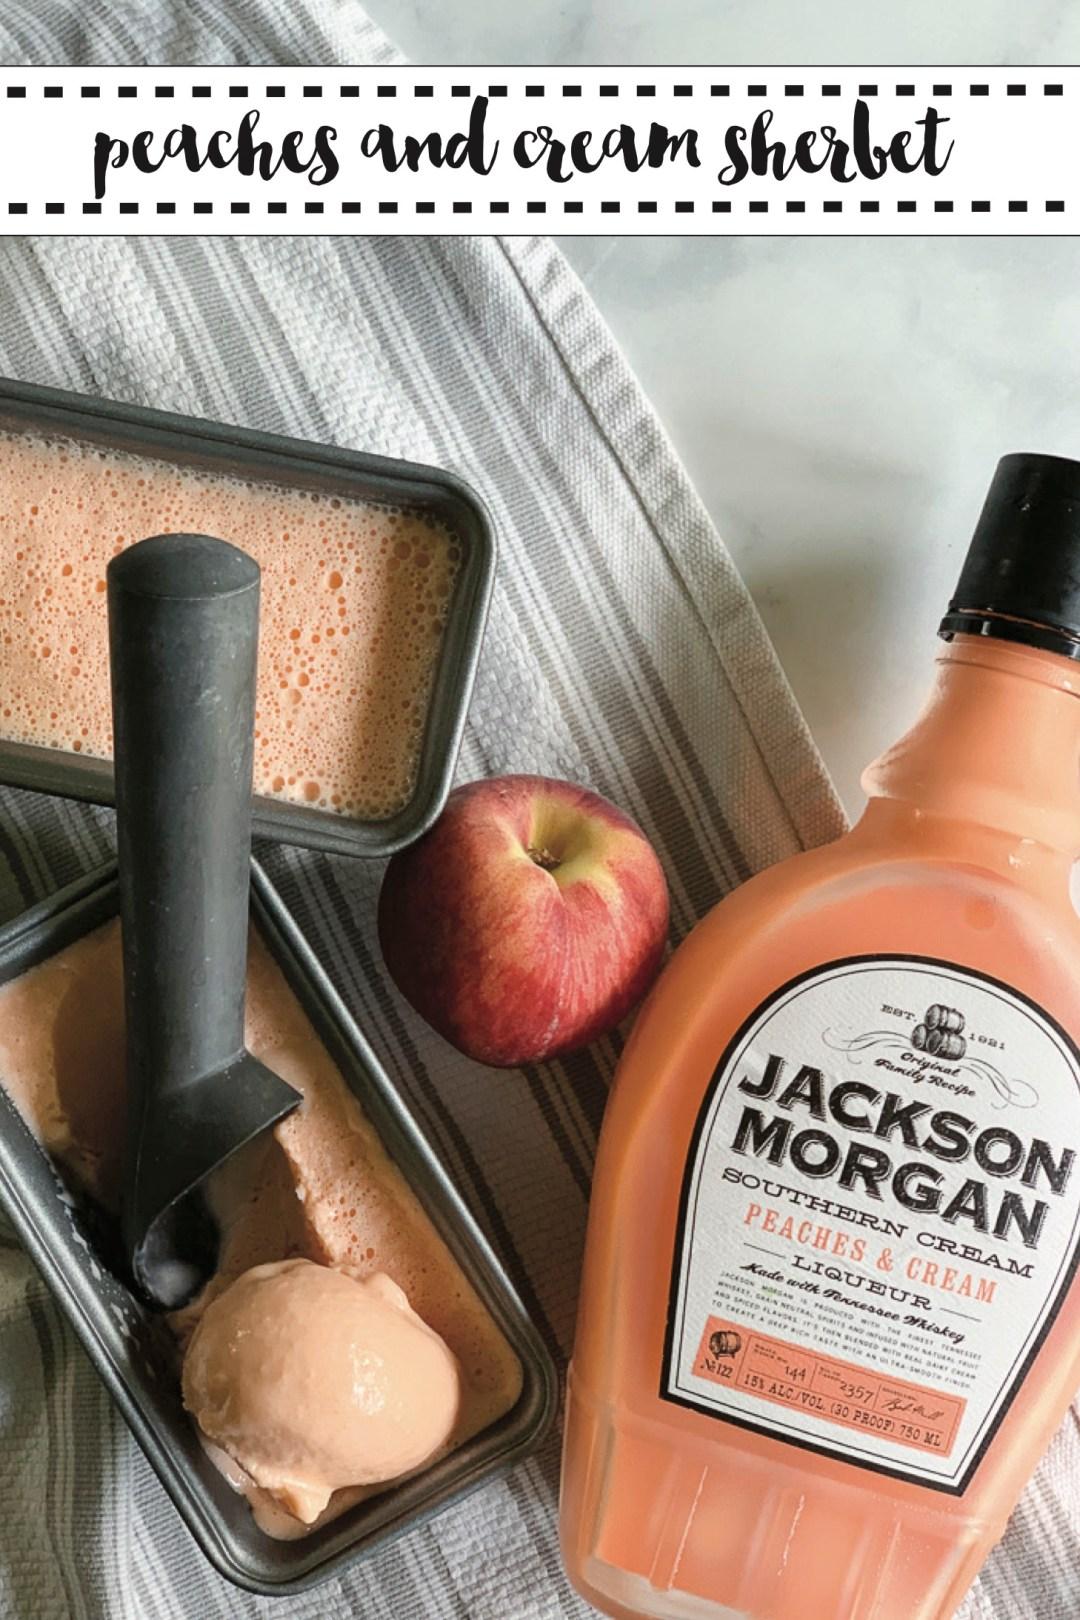 Jackson Morgan Southern Cream Peaches and Cream